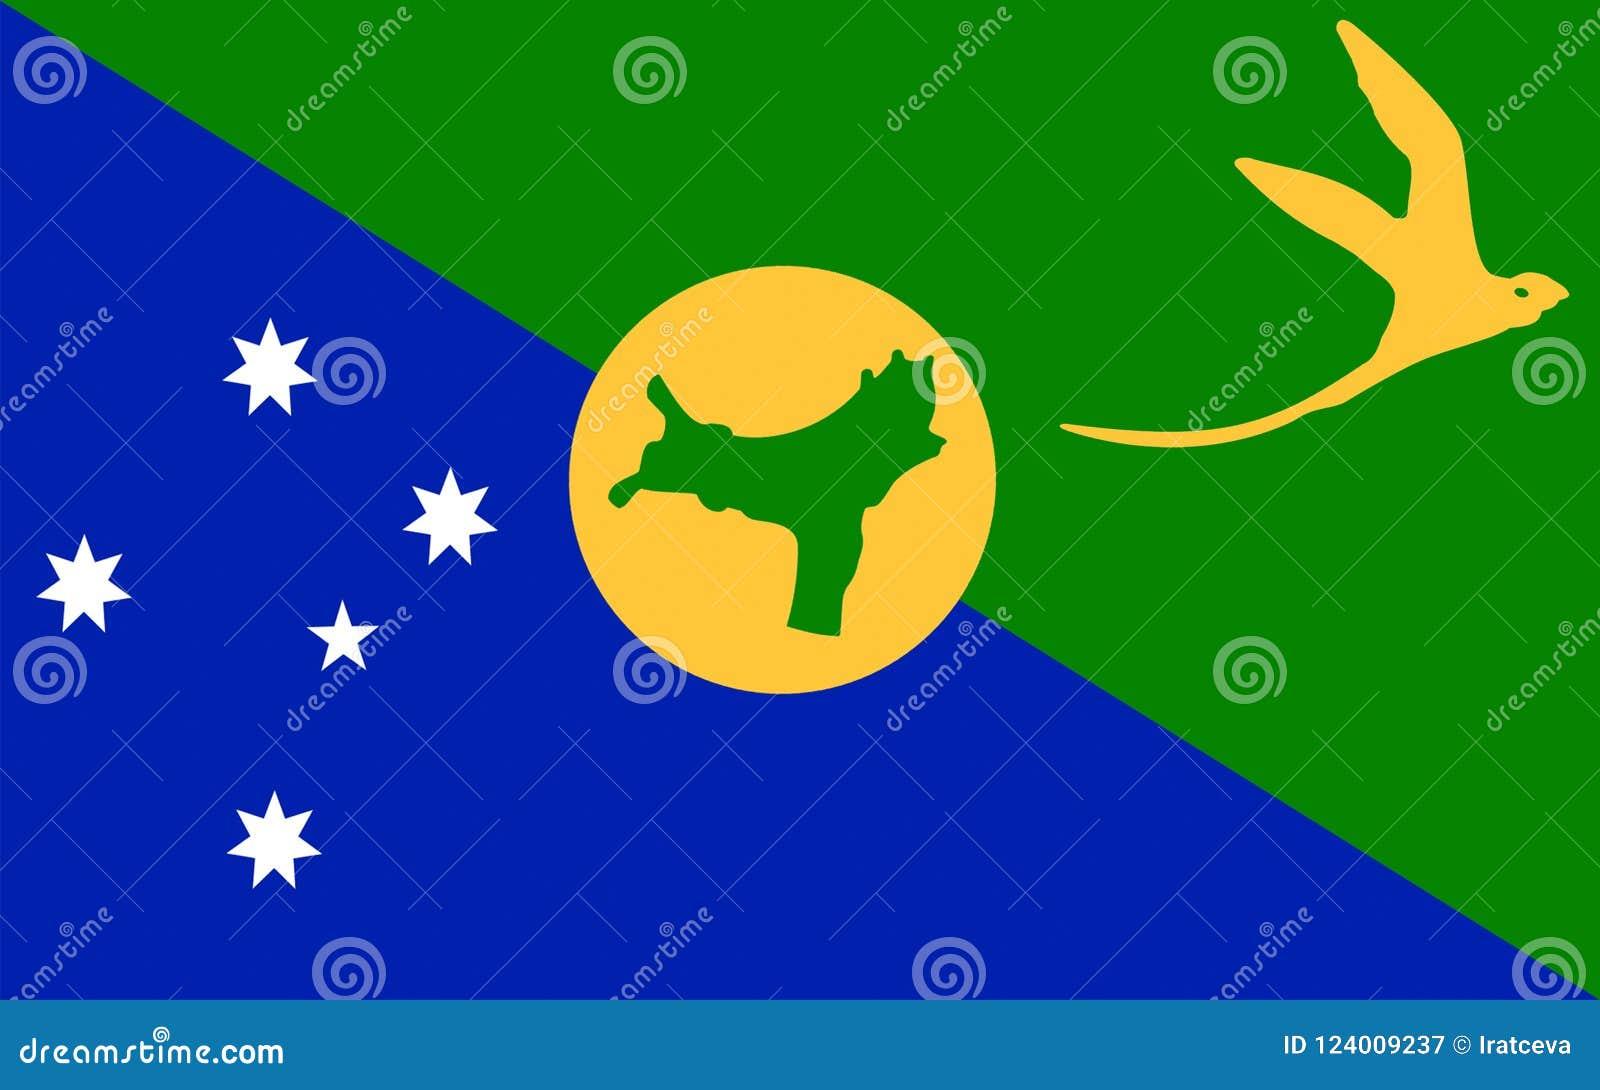 Flag of Christmas Island stock illustration. Illustration of australian - 124009237